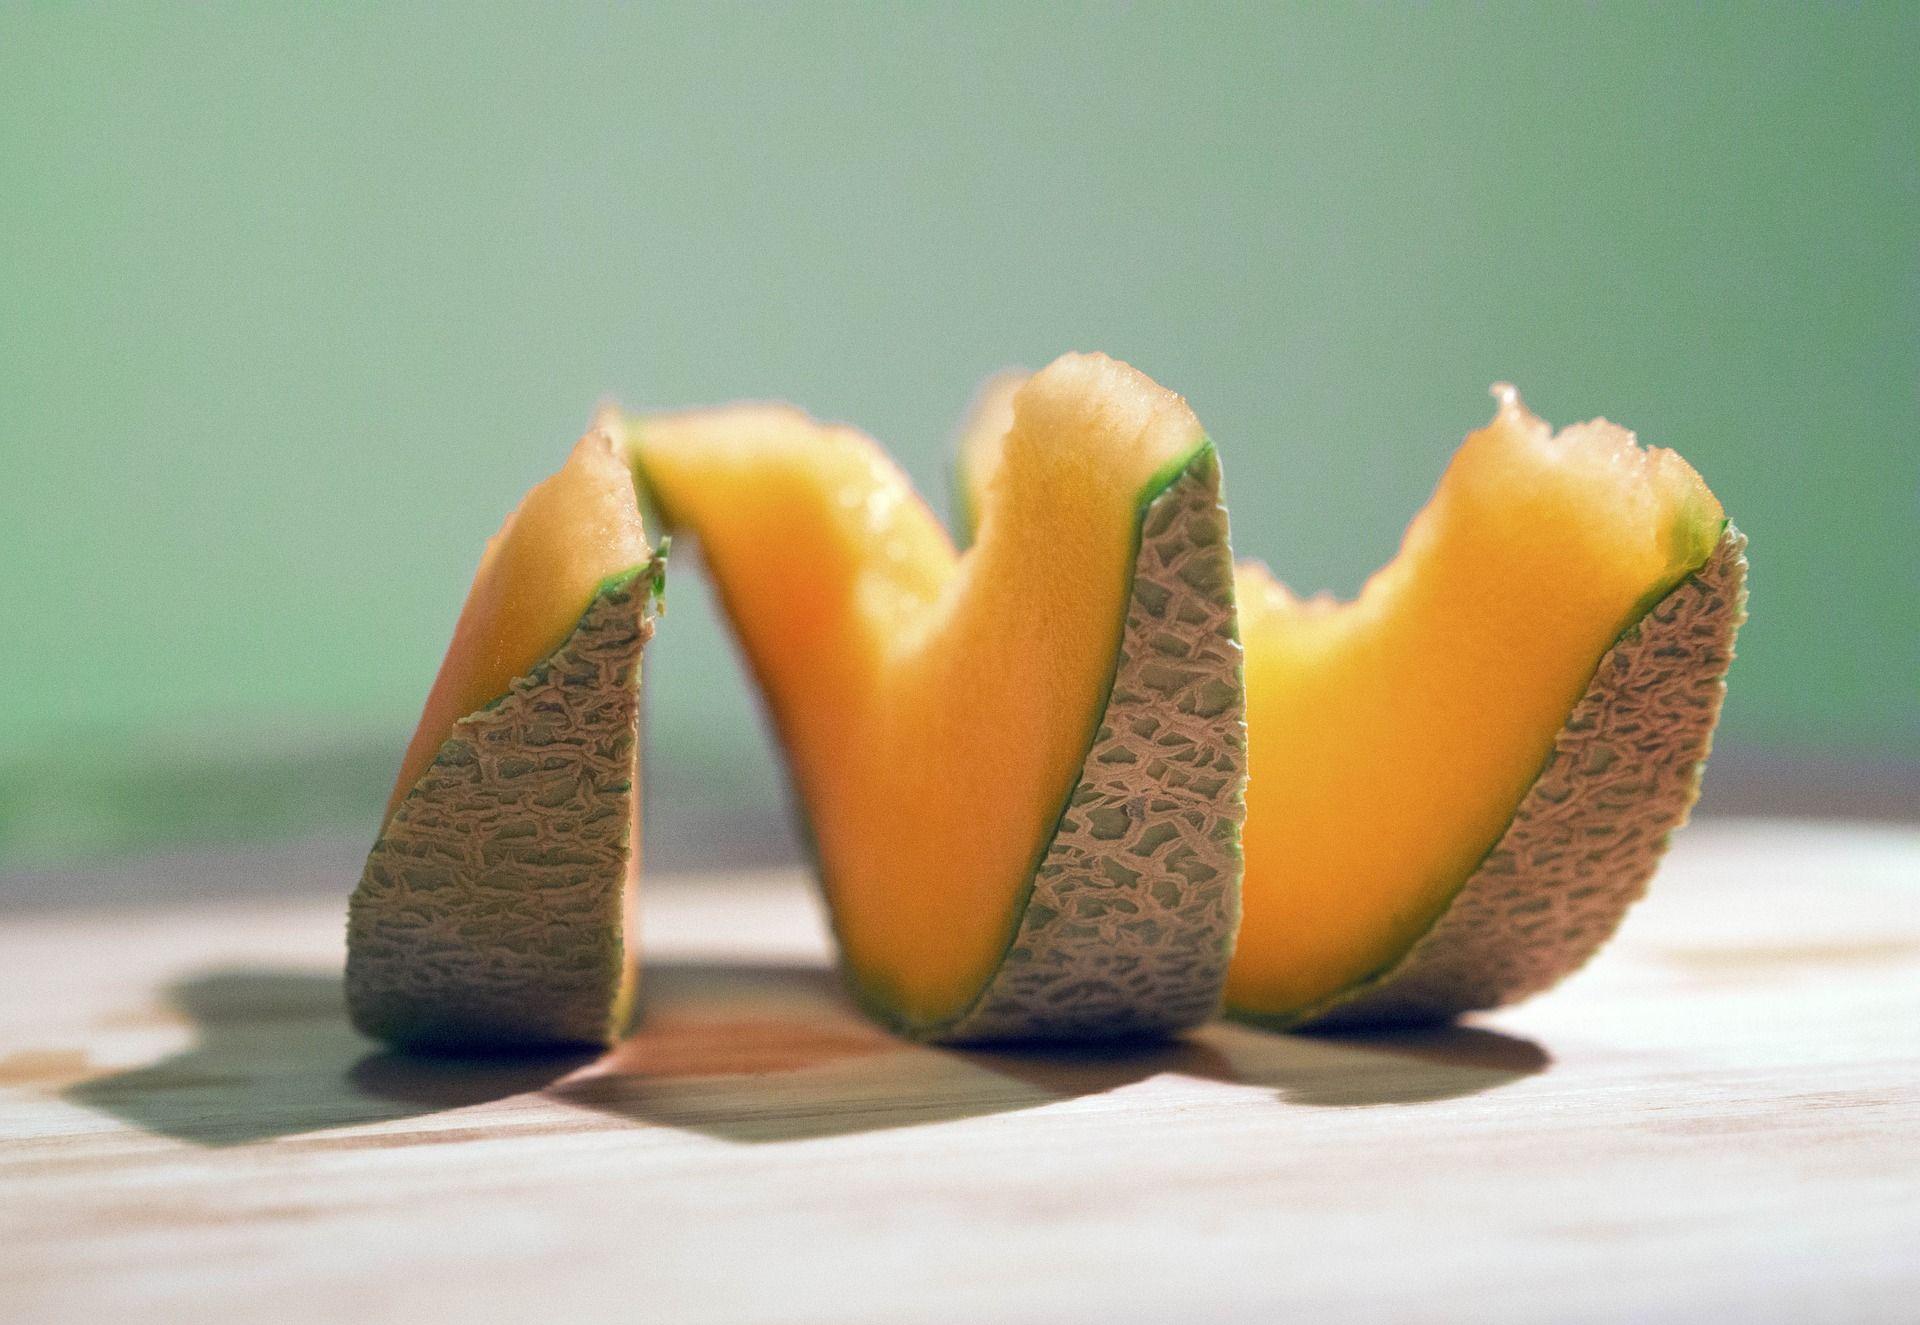 melone rimedi naturali scottature